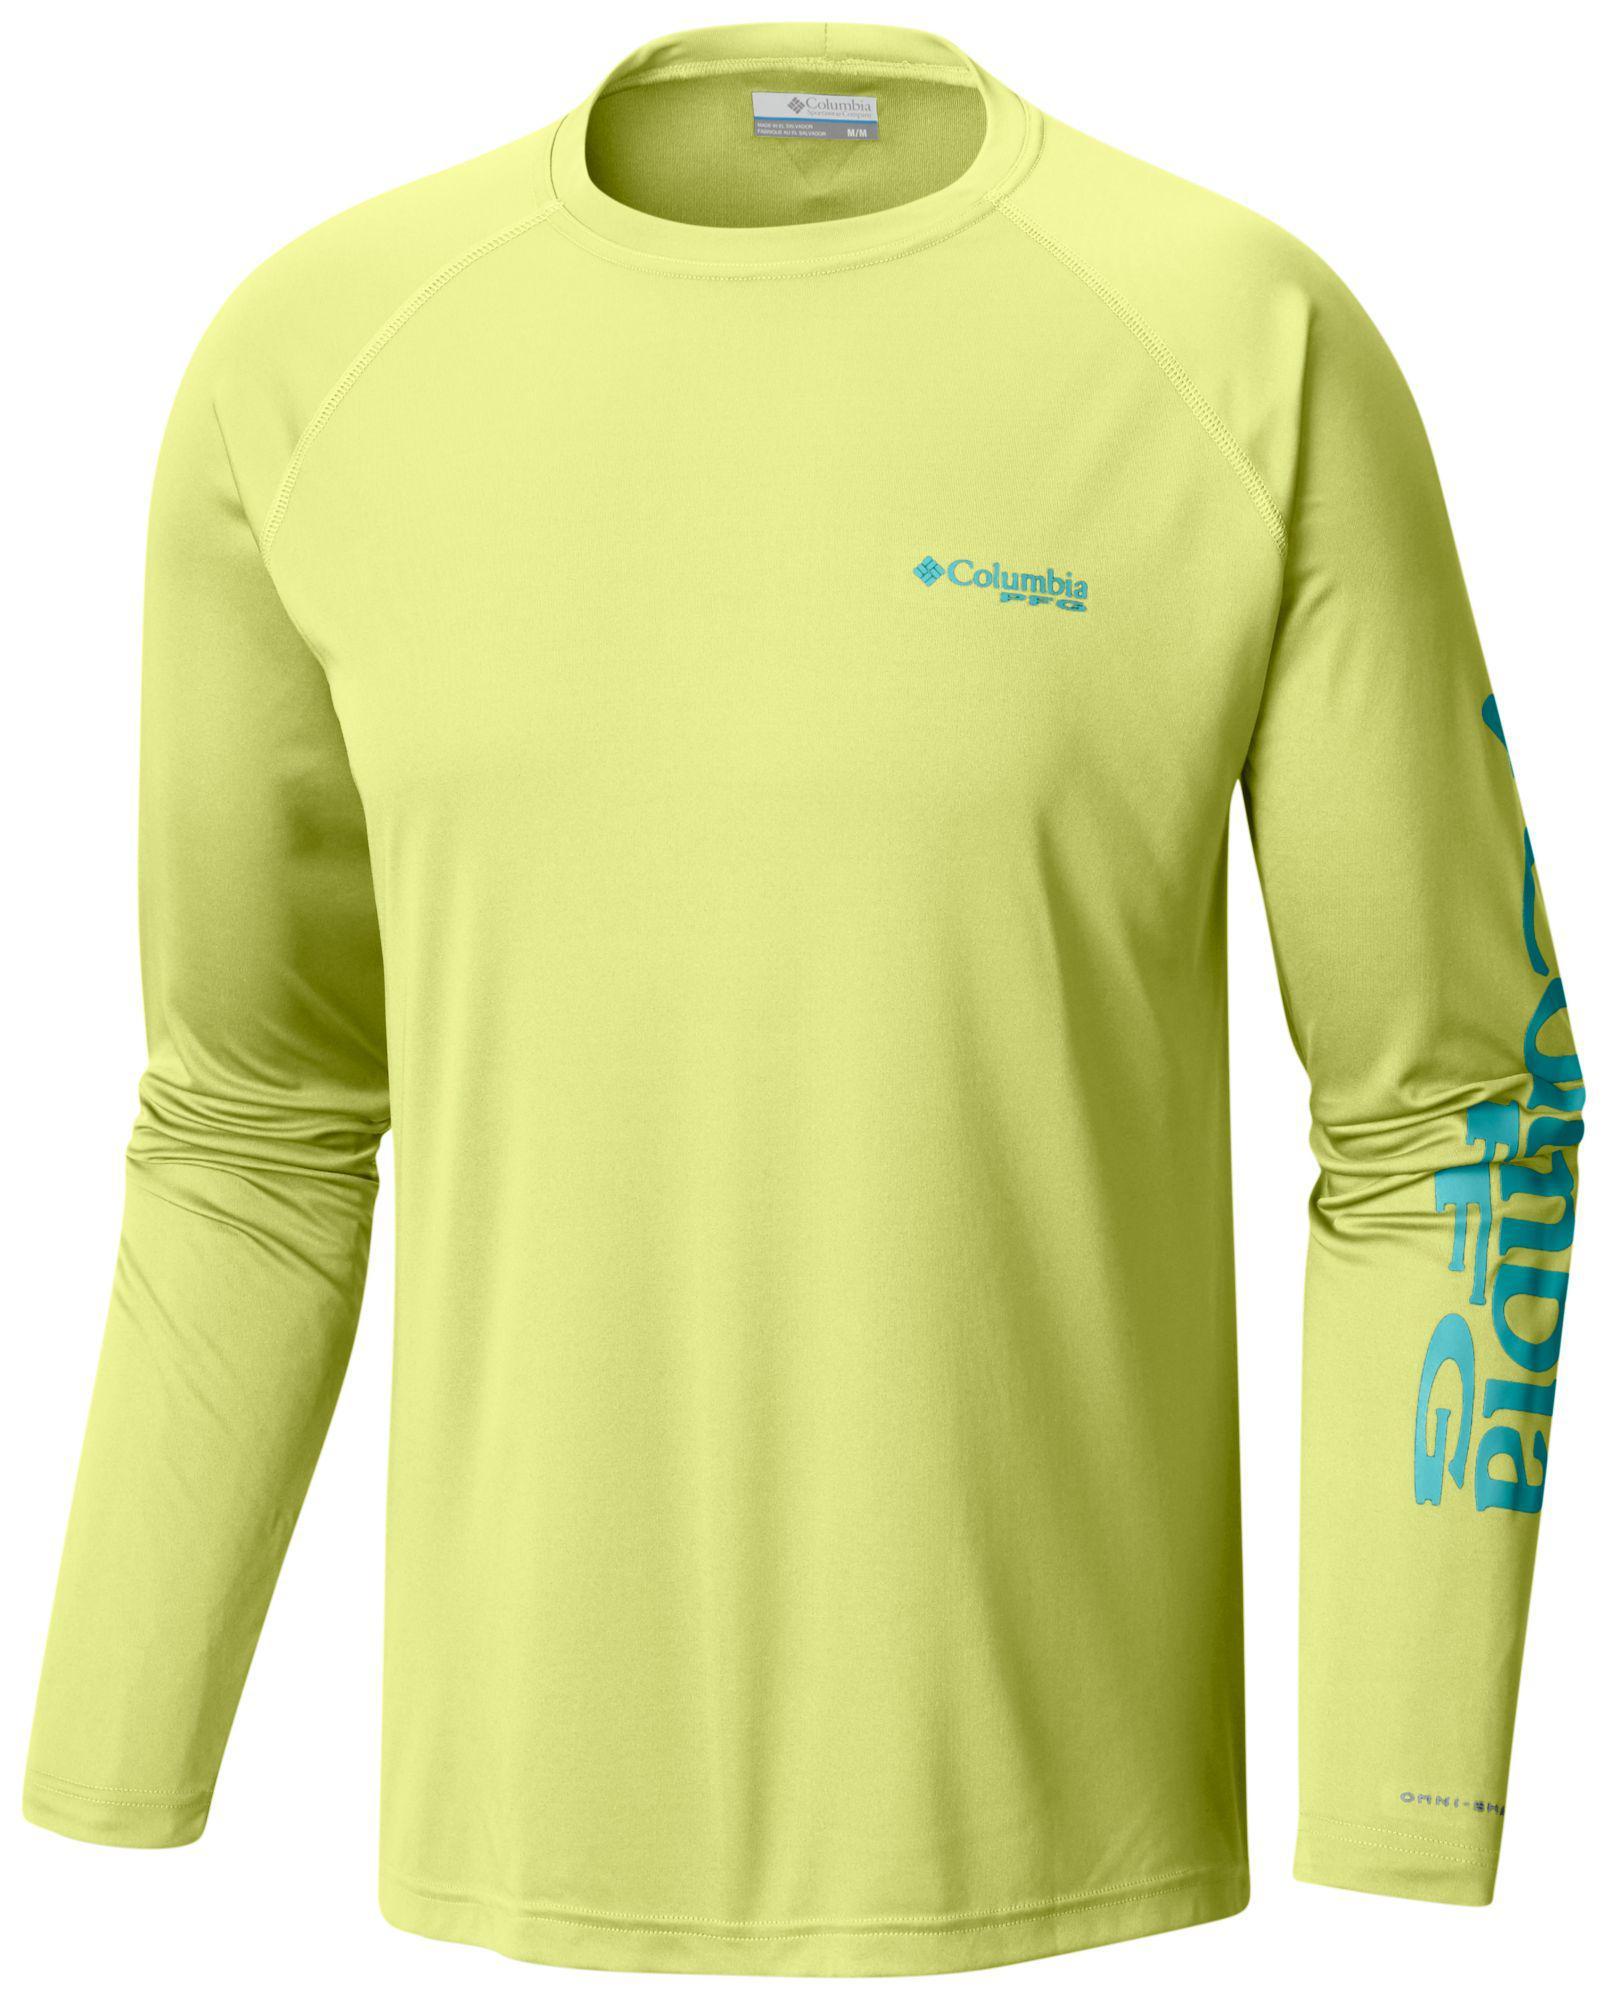 8dec276e096 Columbia Pfg Terminal Tackle Long Sleeve Shirt in Yellow for Men - Lyst